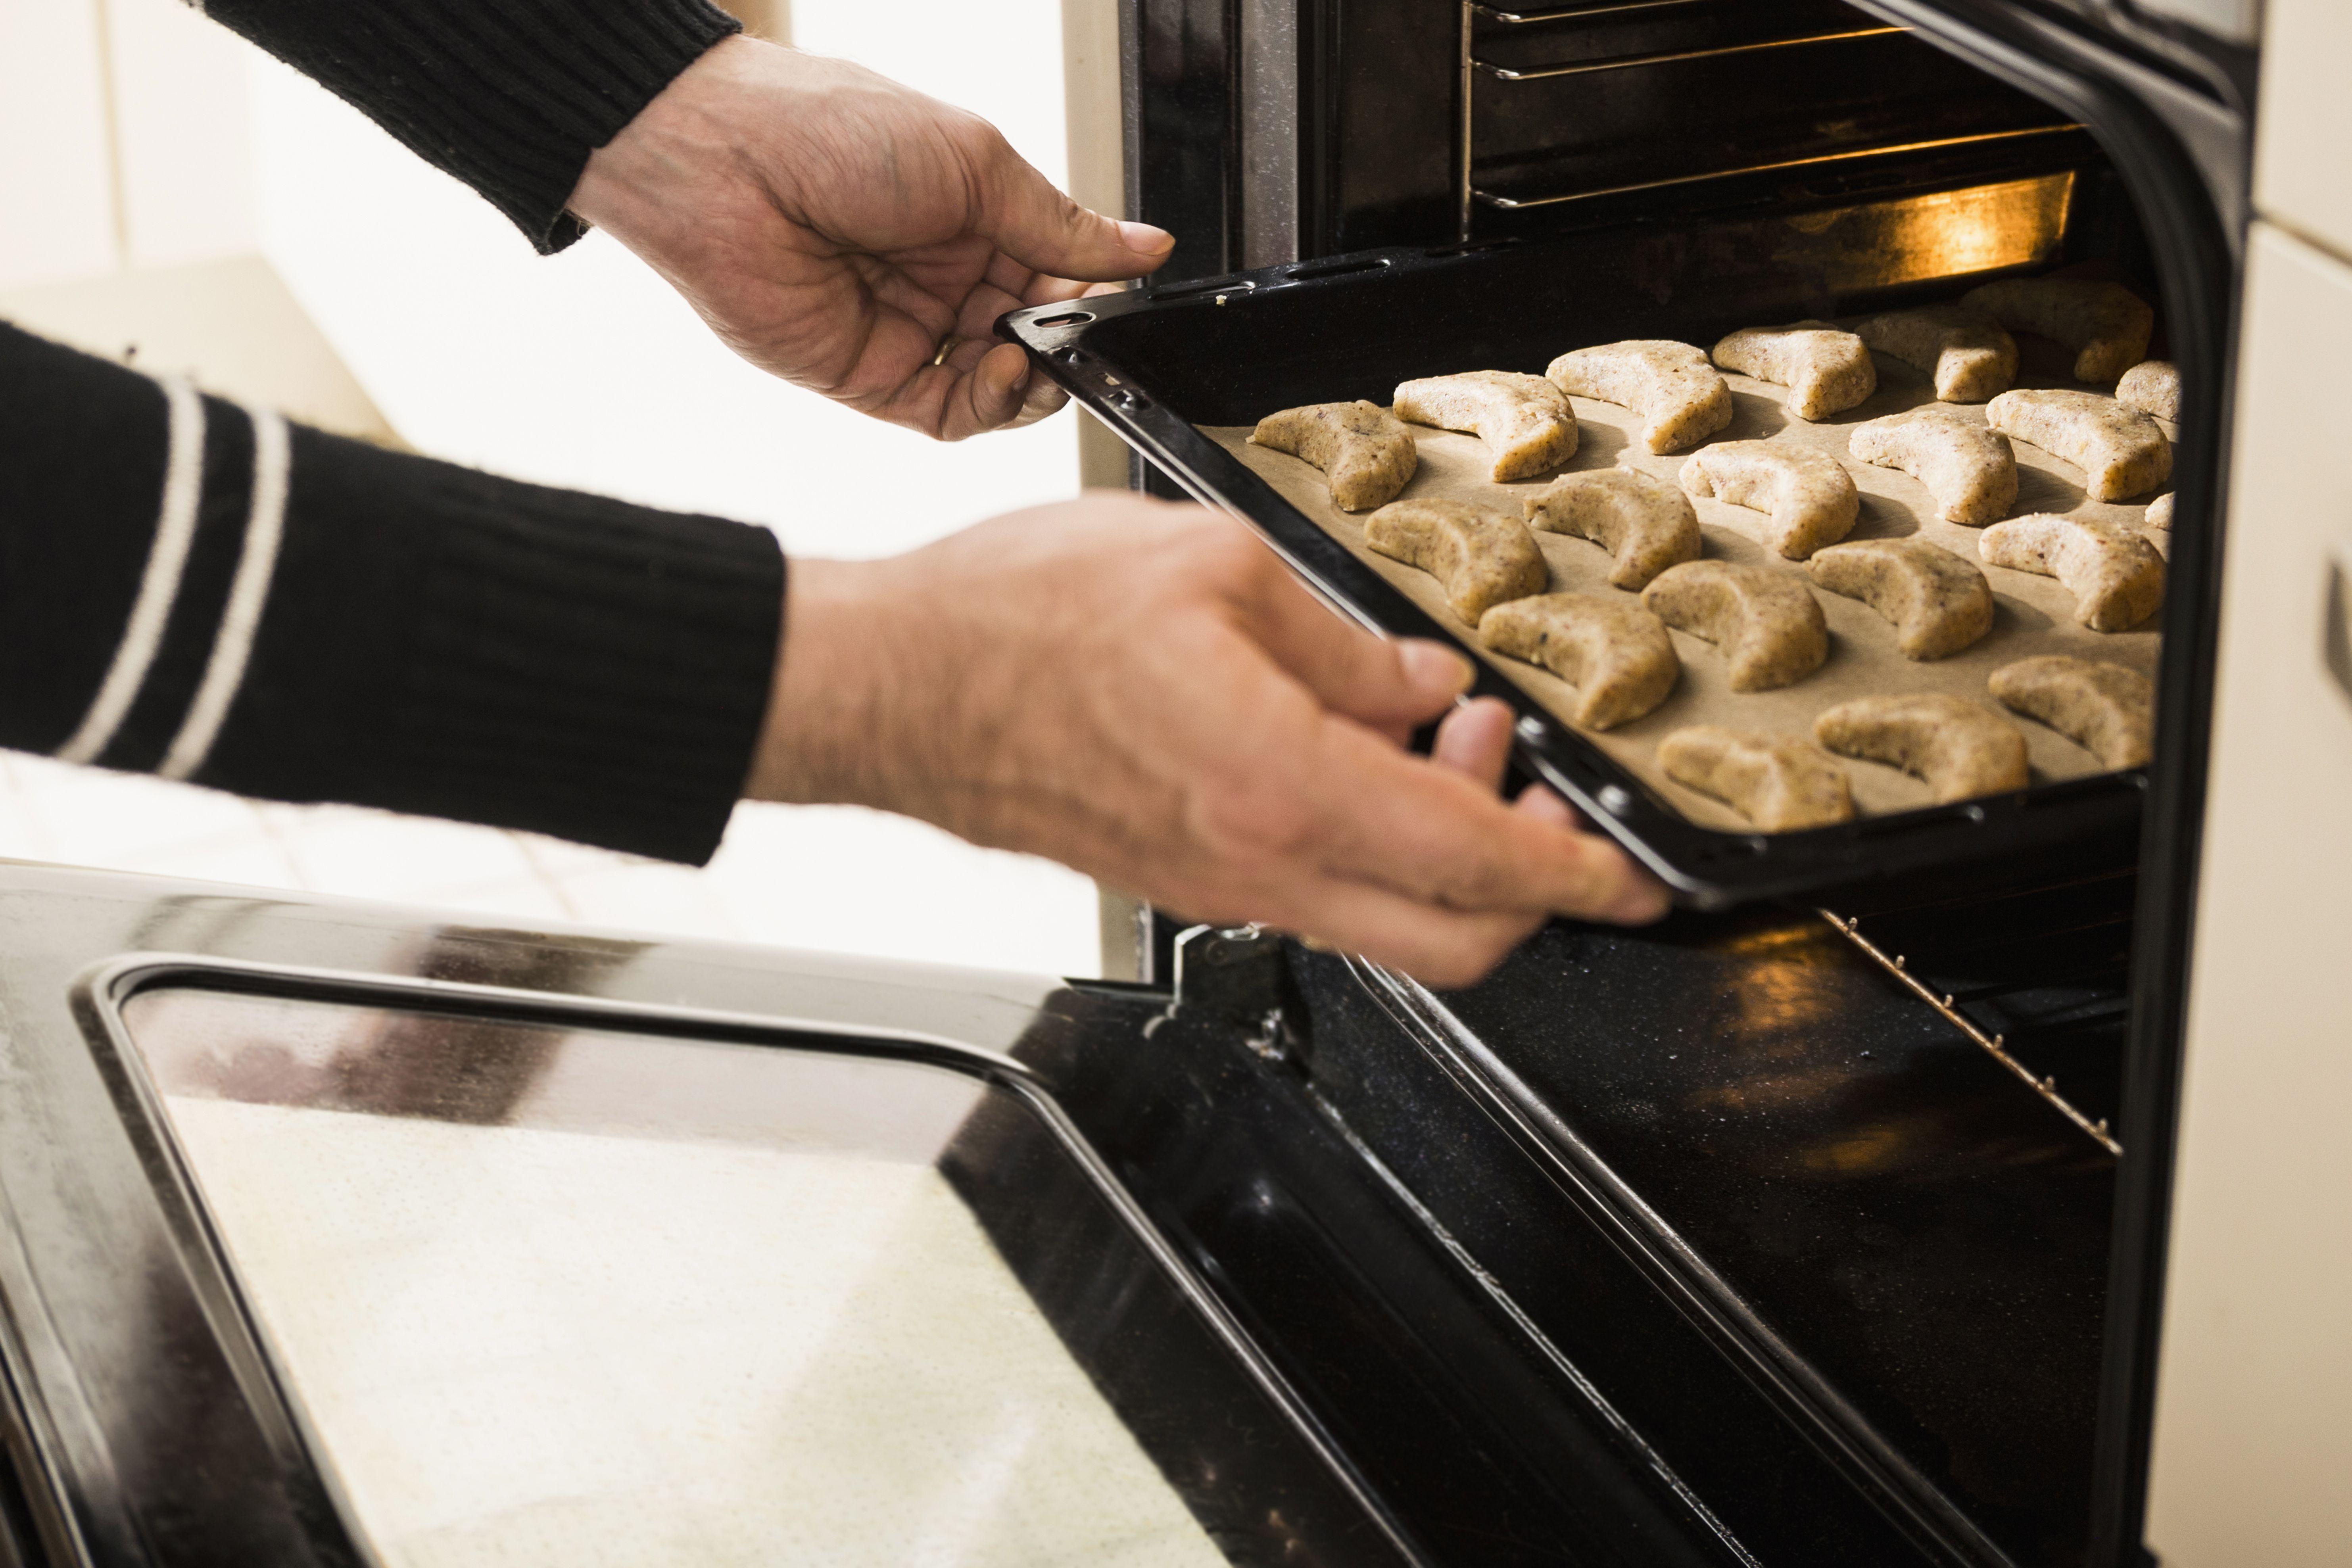 Oven temperature conversions celsius to fahrenheit for Oven temperature for fish